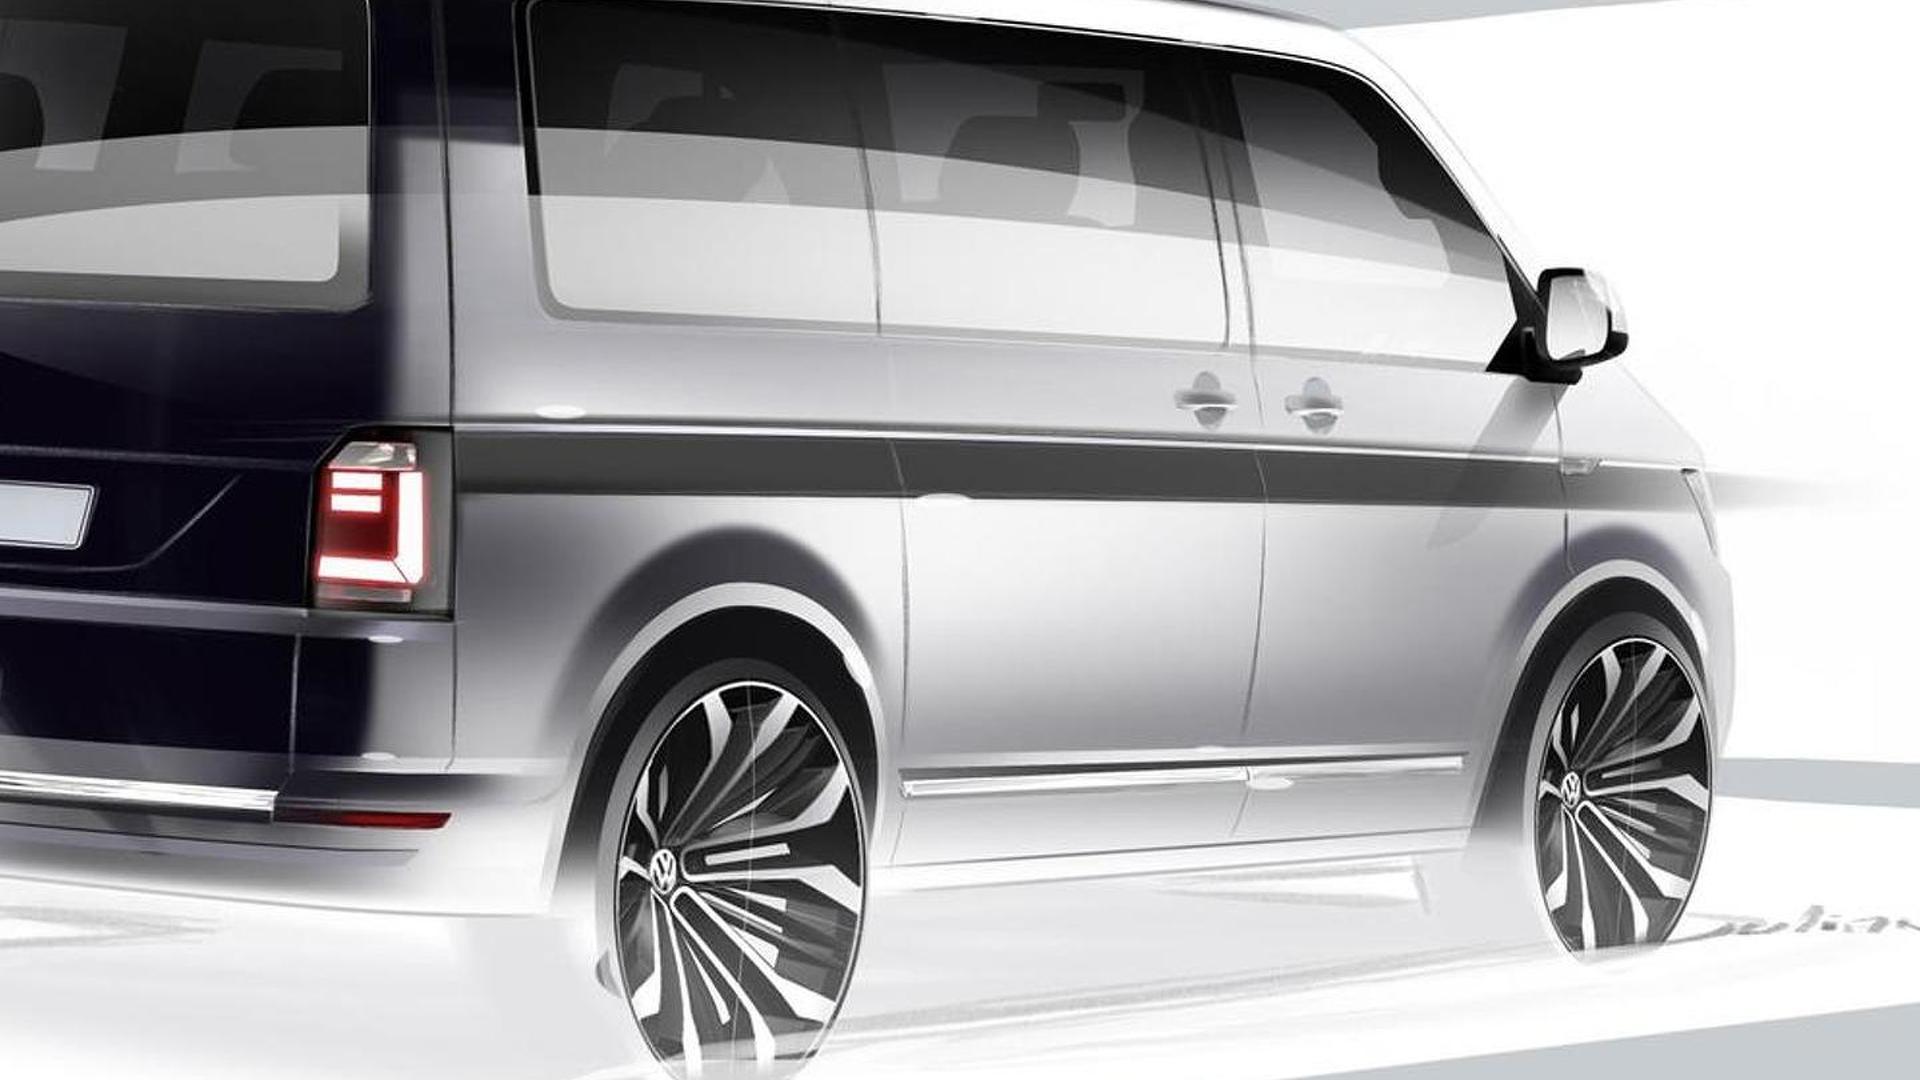 Volkswagen T6 teased prior to April 15 reveal